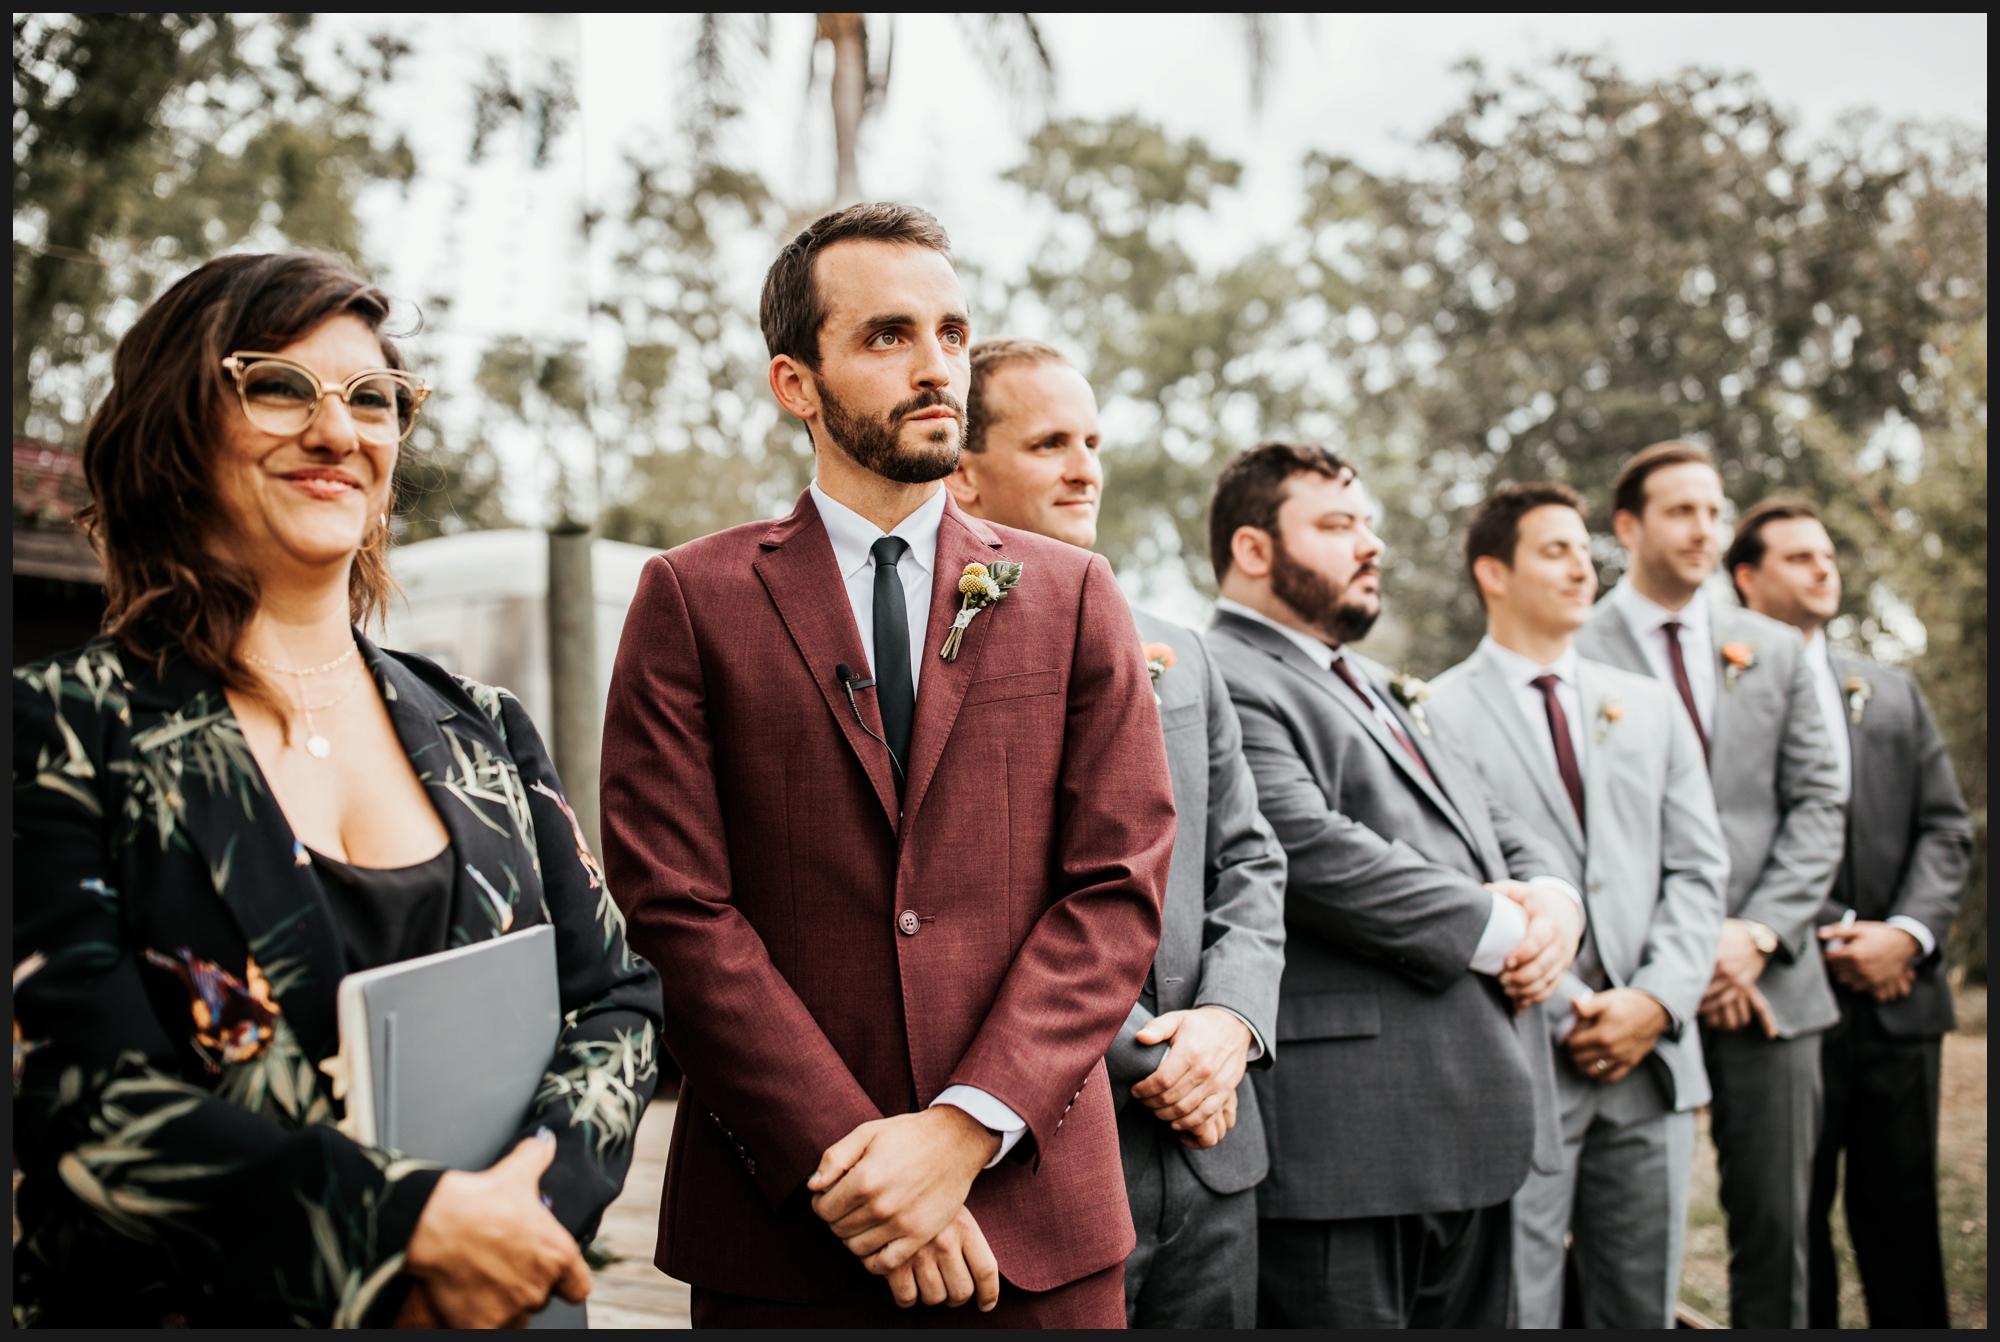 Orlando-Wedding-Photographer-destination-wedding-photographer-florida-wedding-photographer-bohemian-wedding-photographer_2001.jpg